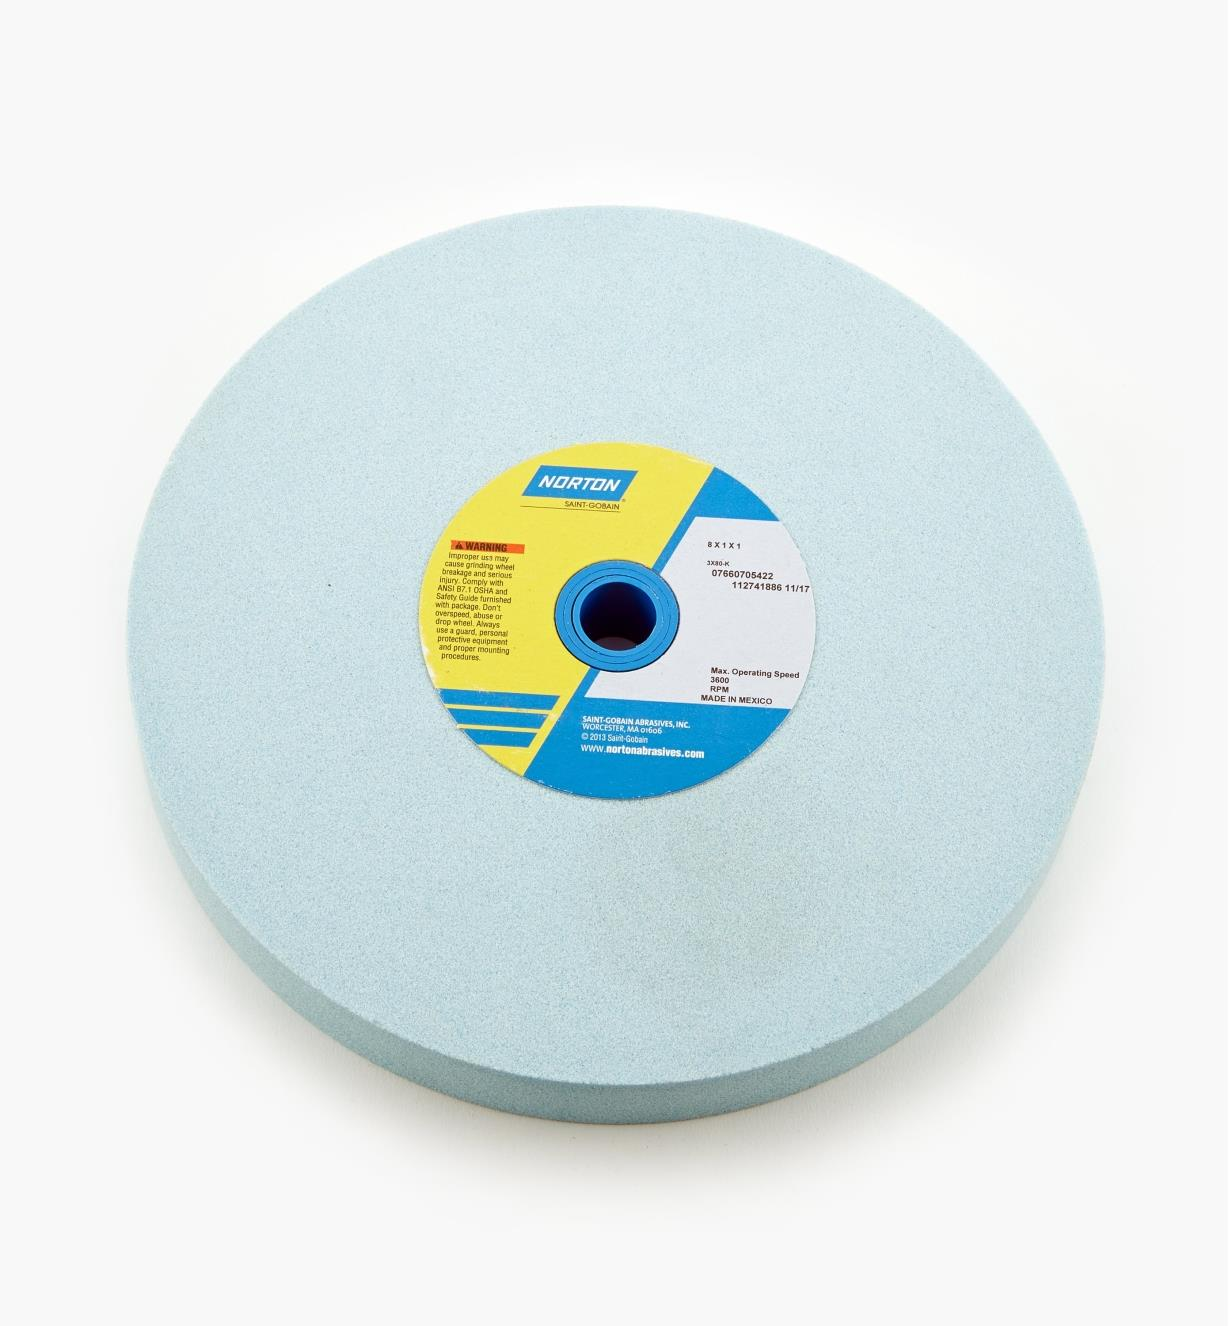 "08M2303 - Norton 3X Grinding Wheel, 80x, 8"" x 1"""